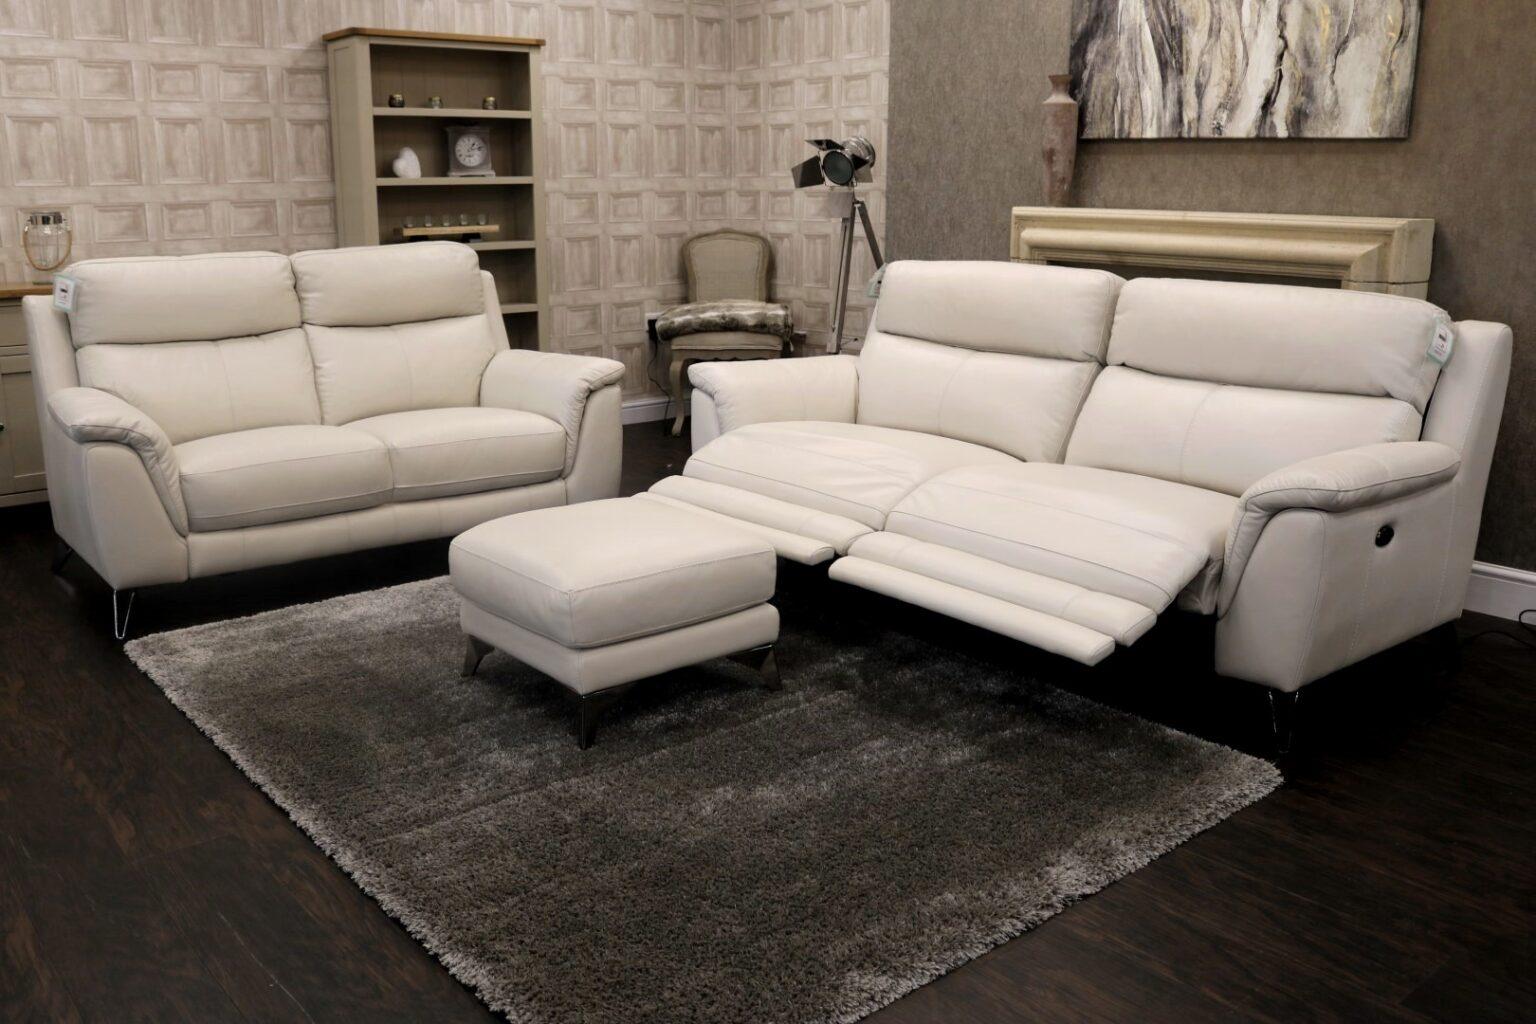 New Incanto Contempo (Famous Designer Brand) Premium Soft With Regard To Contempo Power Reclining Sofas (View 9 of 15)